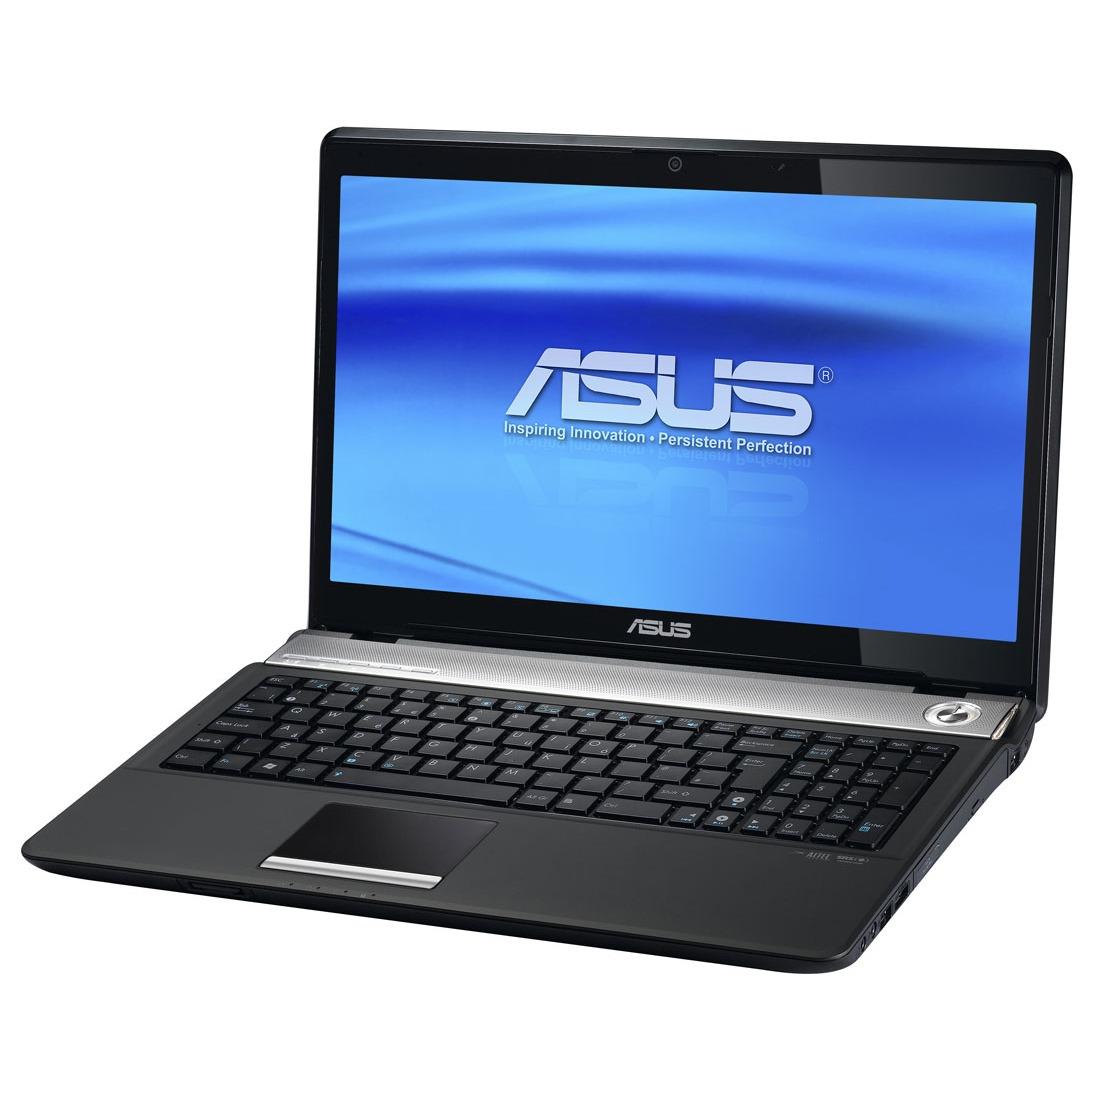 "PC portable ASUS N61VG-JX034V ASUS N61VG-JX034V - Intel Core 2 Duo P7450 4 Go 500 Go 16"" LCD Graveur DVD Wi-Fi N/Bluetooth Webcam Windows 7 Premium (garantie constructeur 2 ans)"